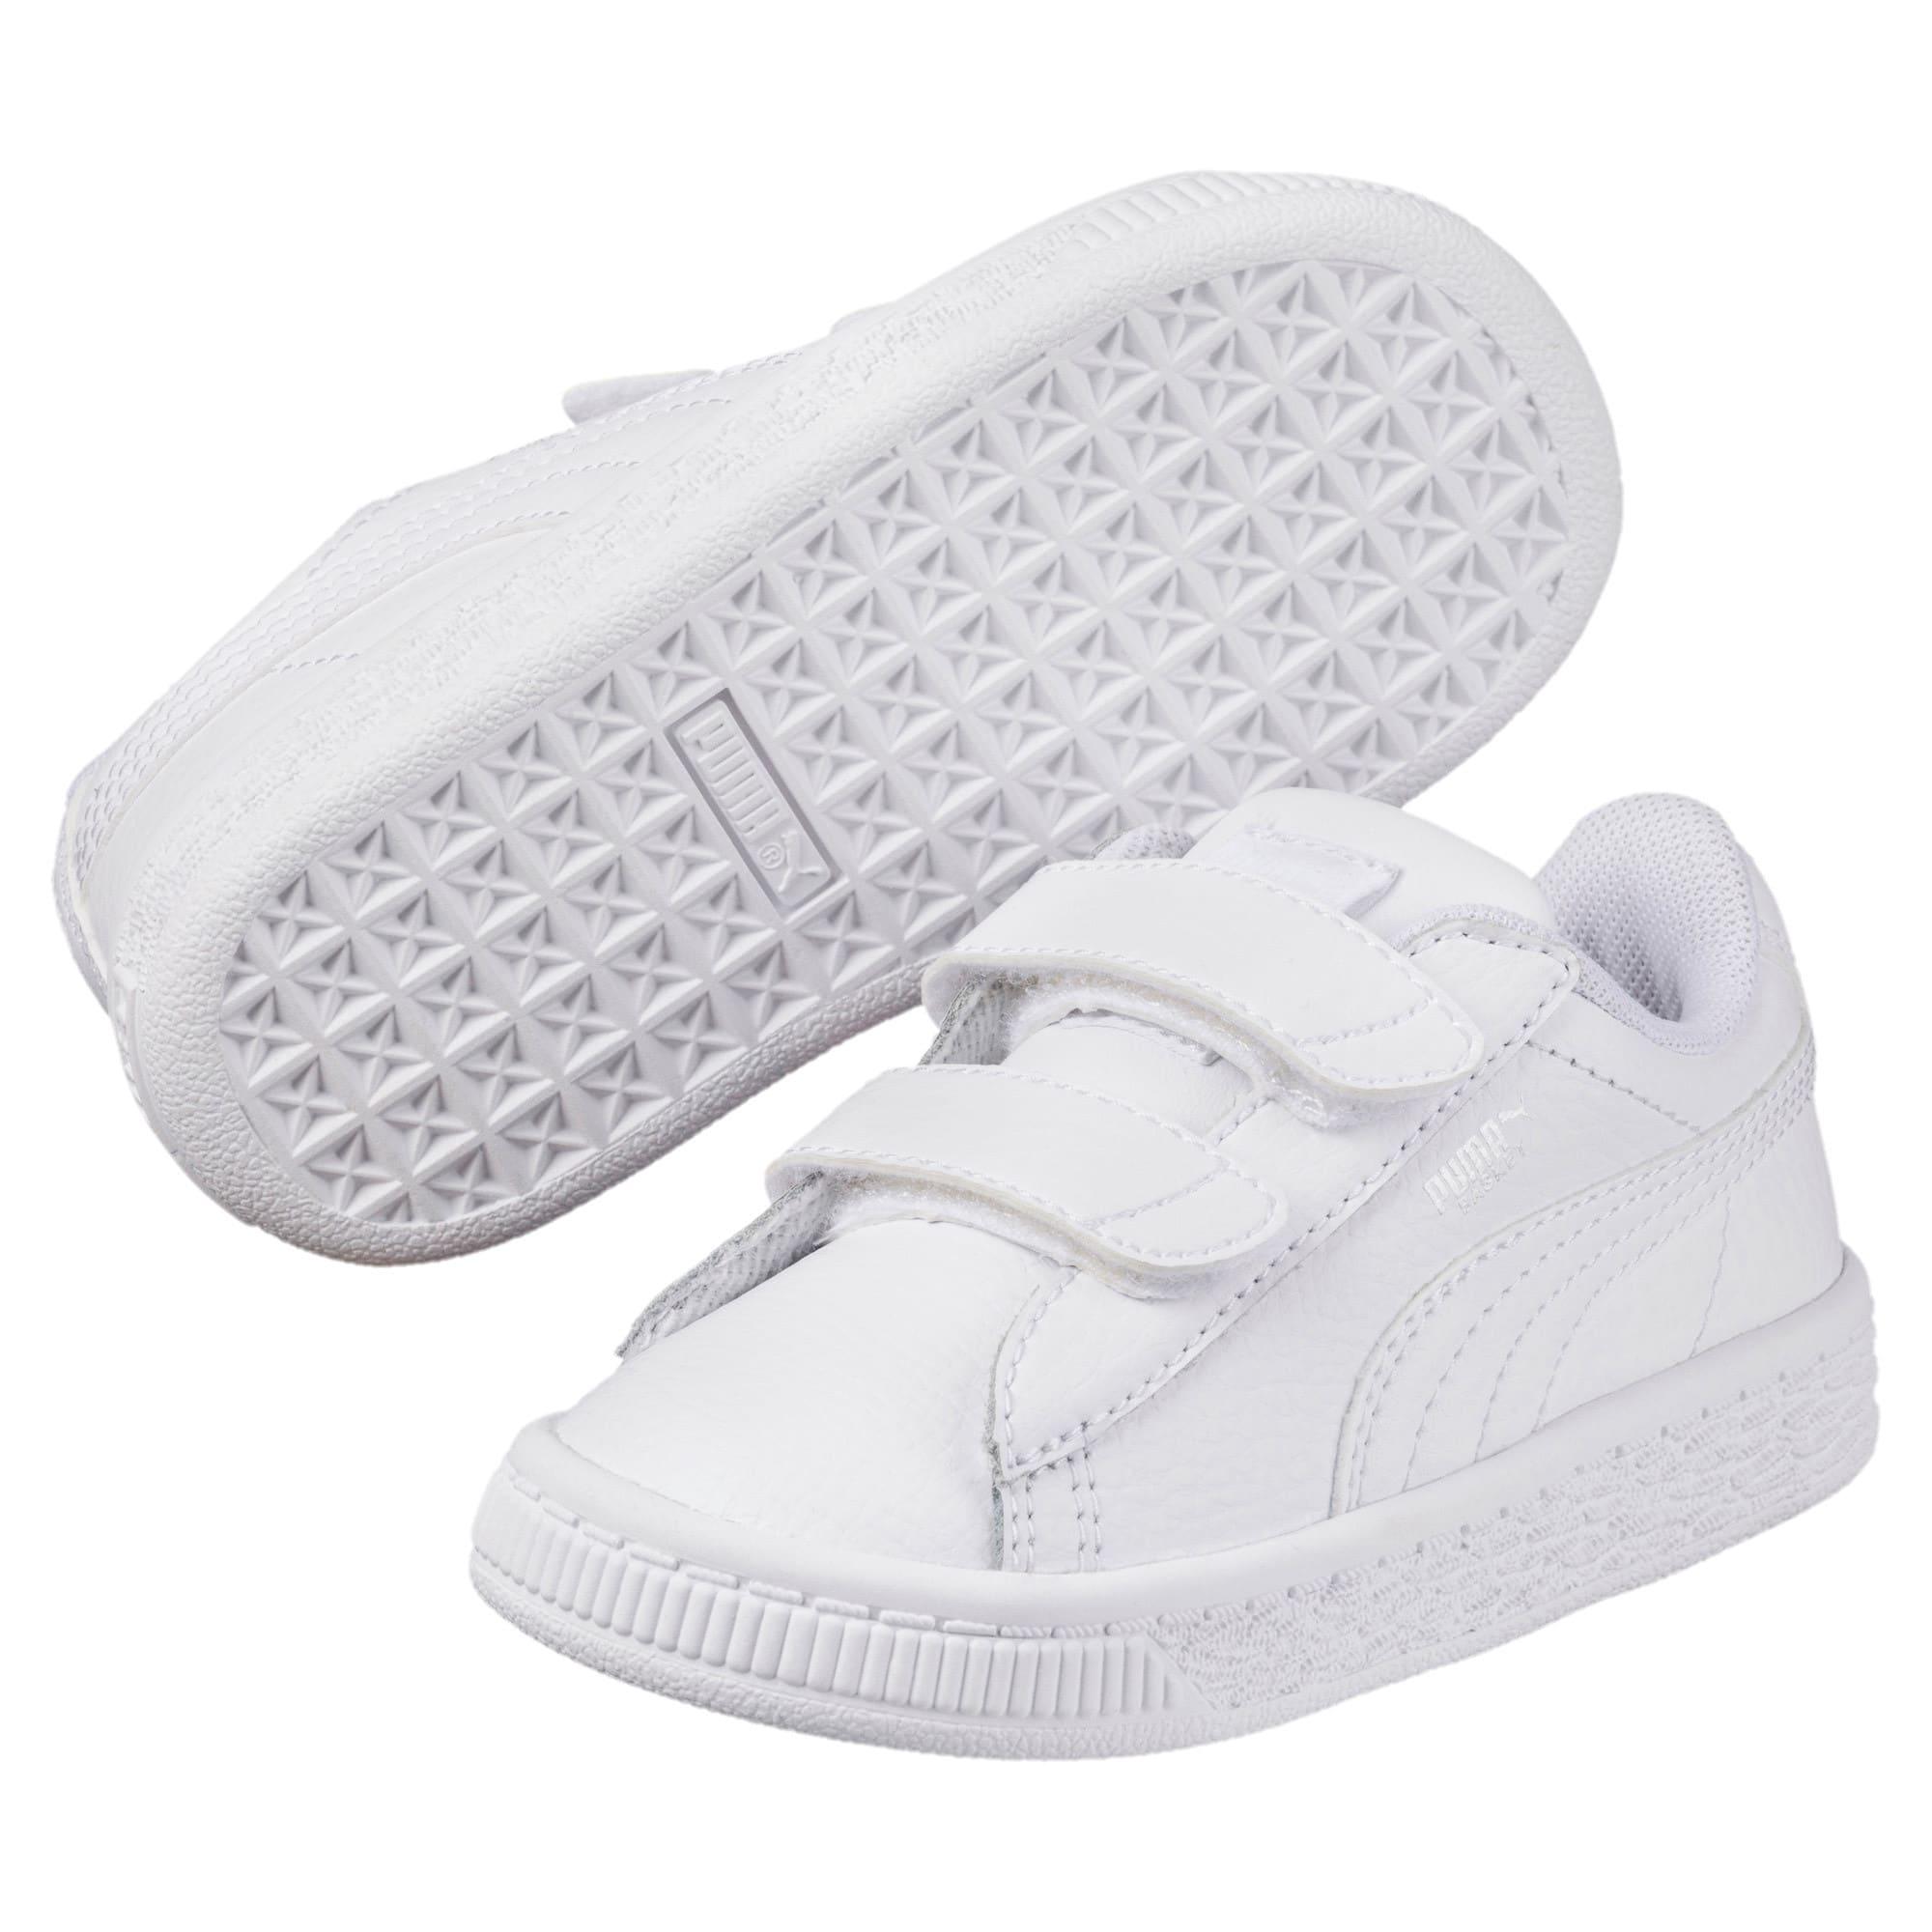 Thumbnail 2 of Basket Classic AC Toddler Shoes, Puma White-Puma White, medium